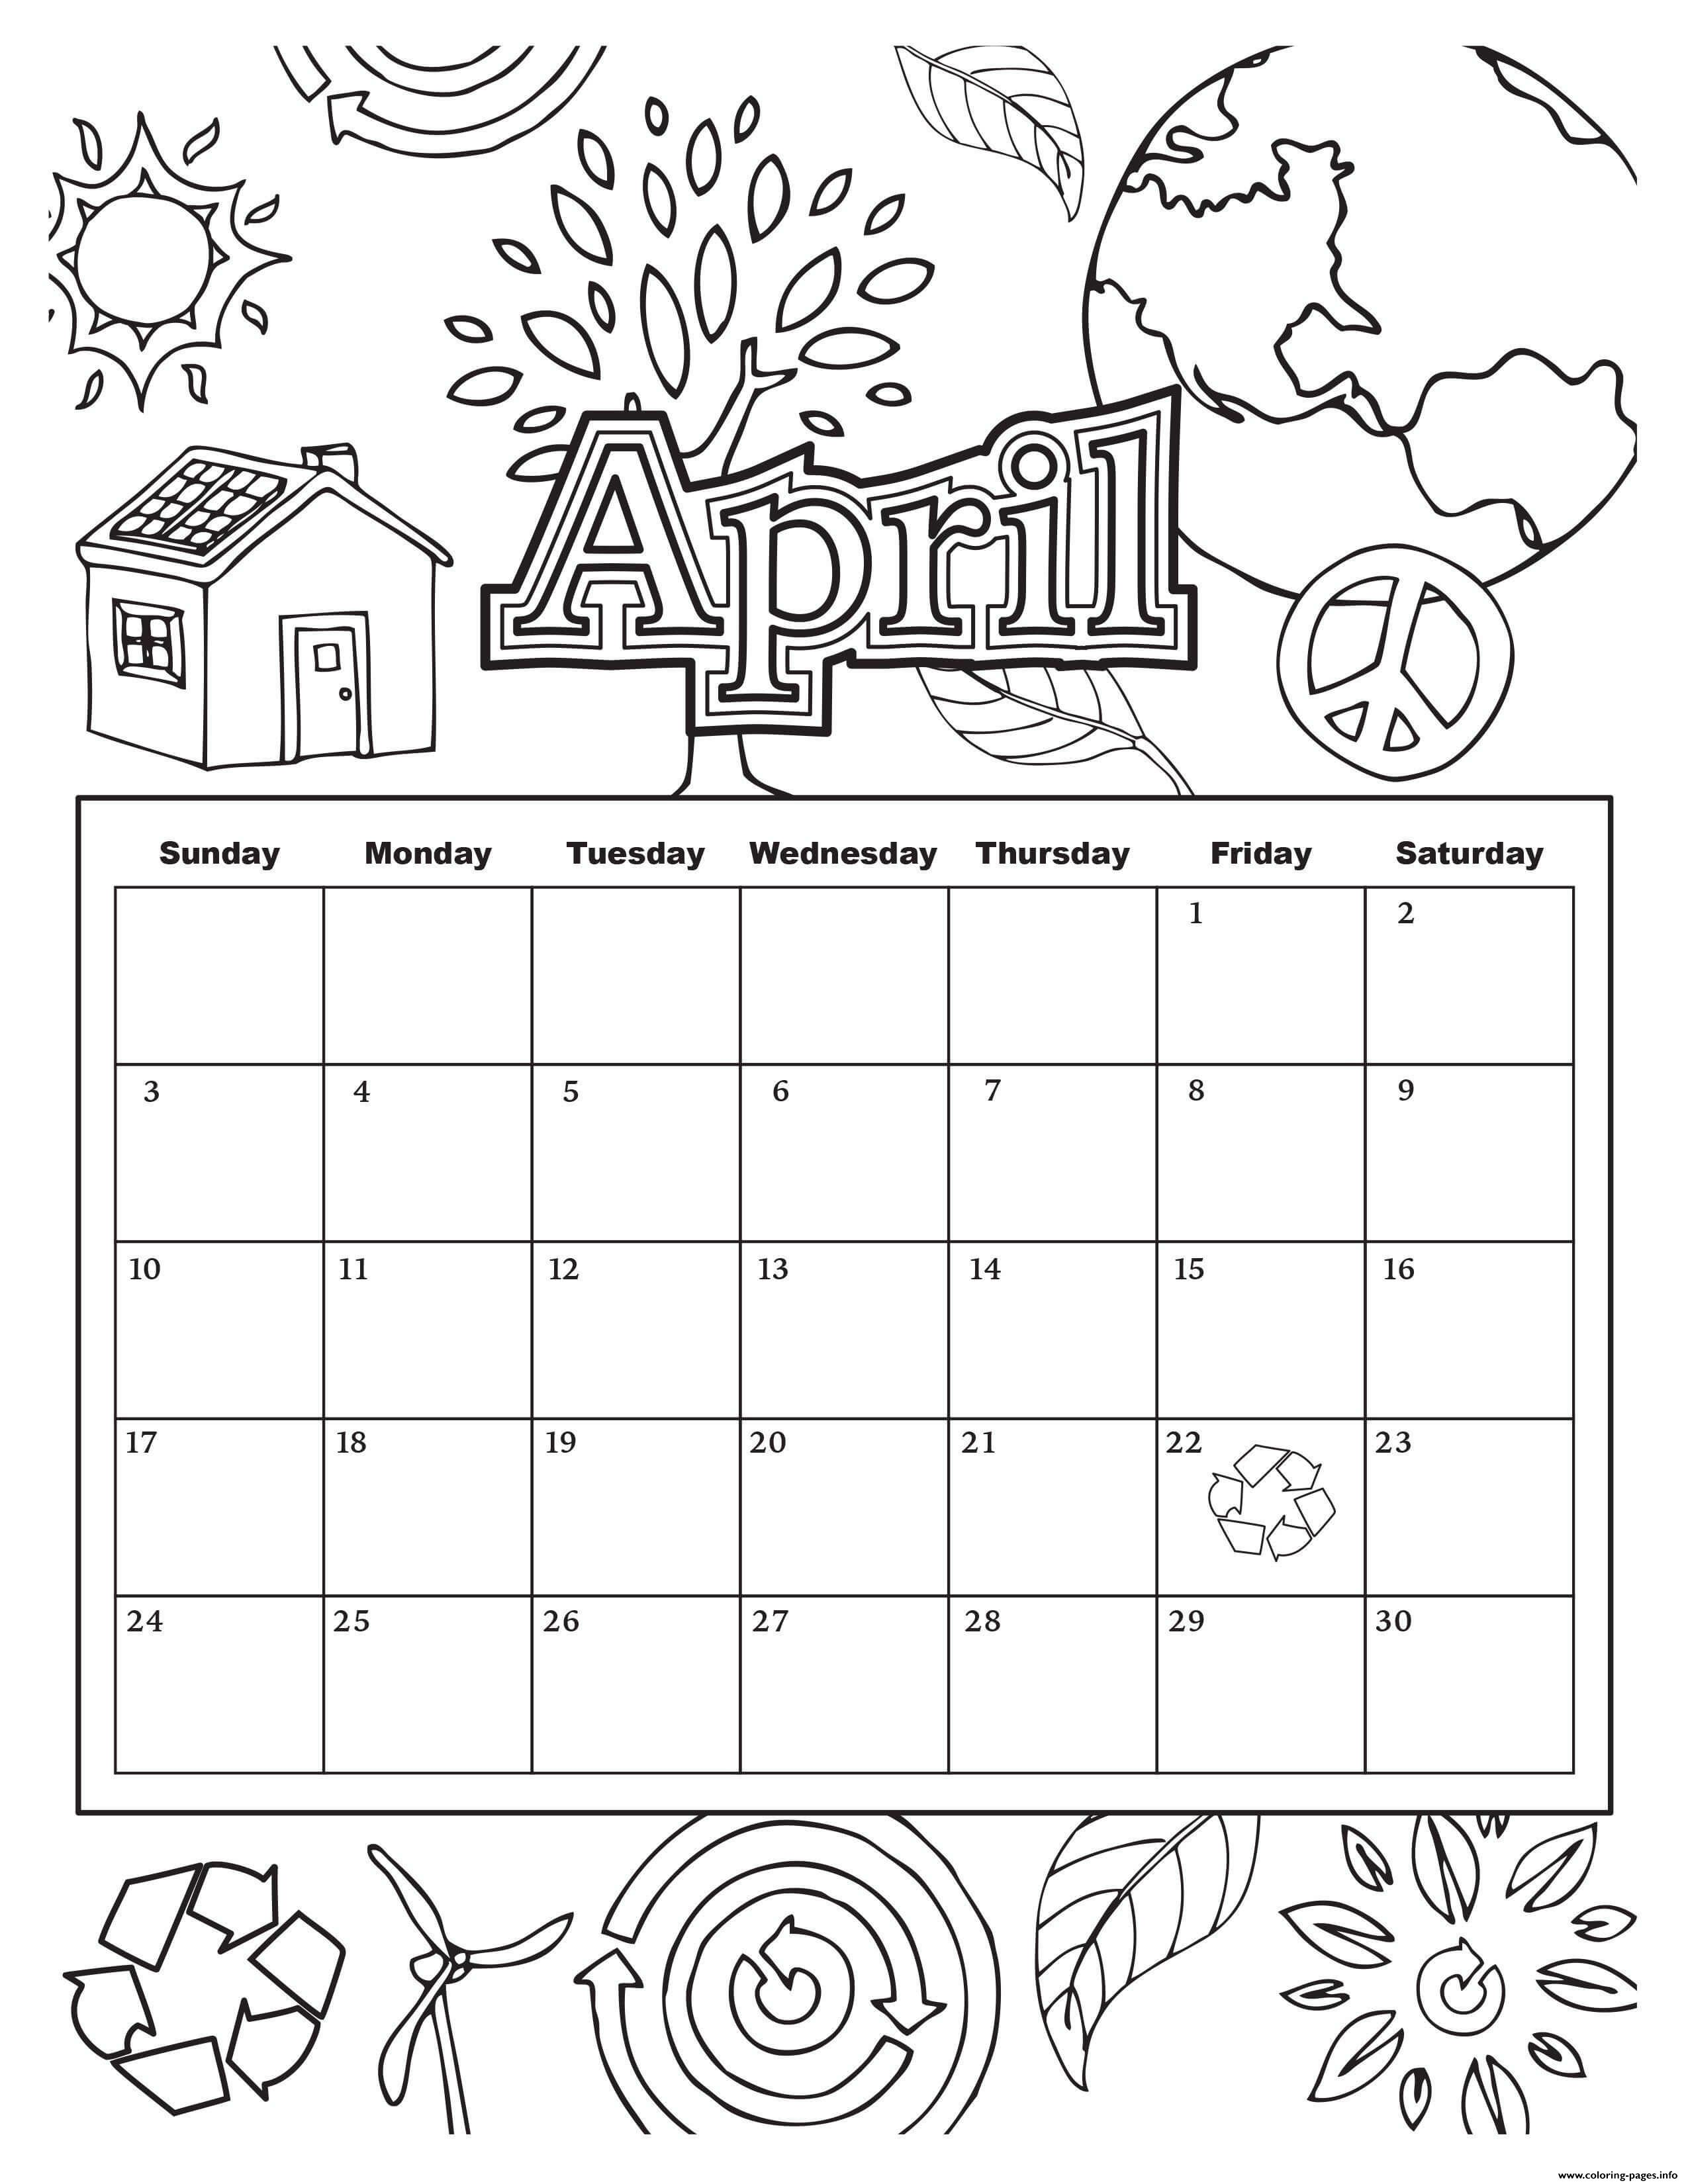 April School Calendar Coloring Pages Printable